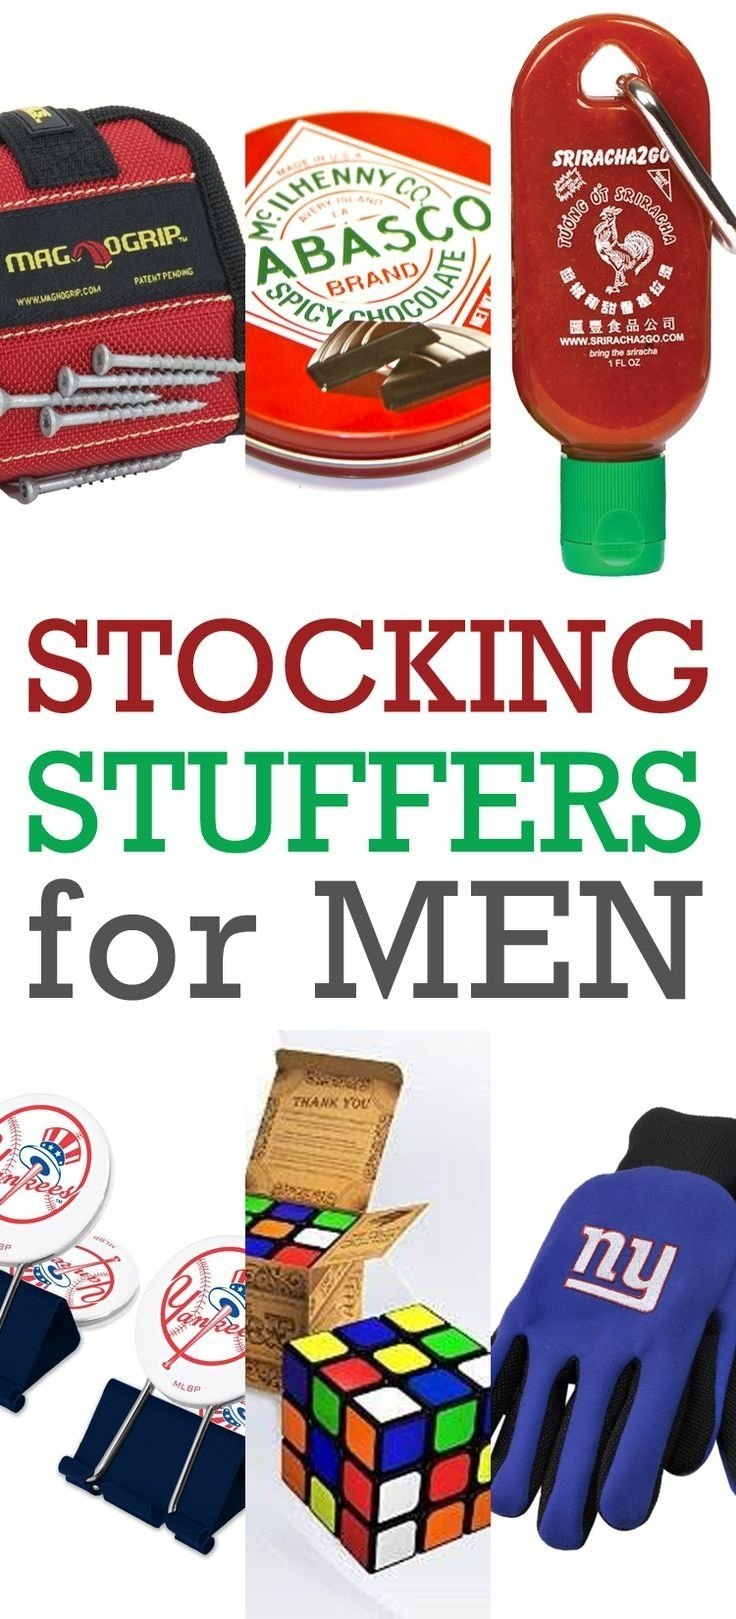 10 Stylish Last Minute Christmas Gift Ideas For Men